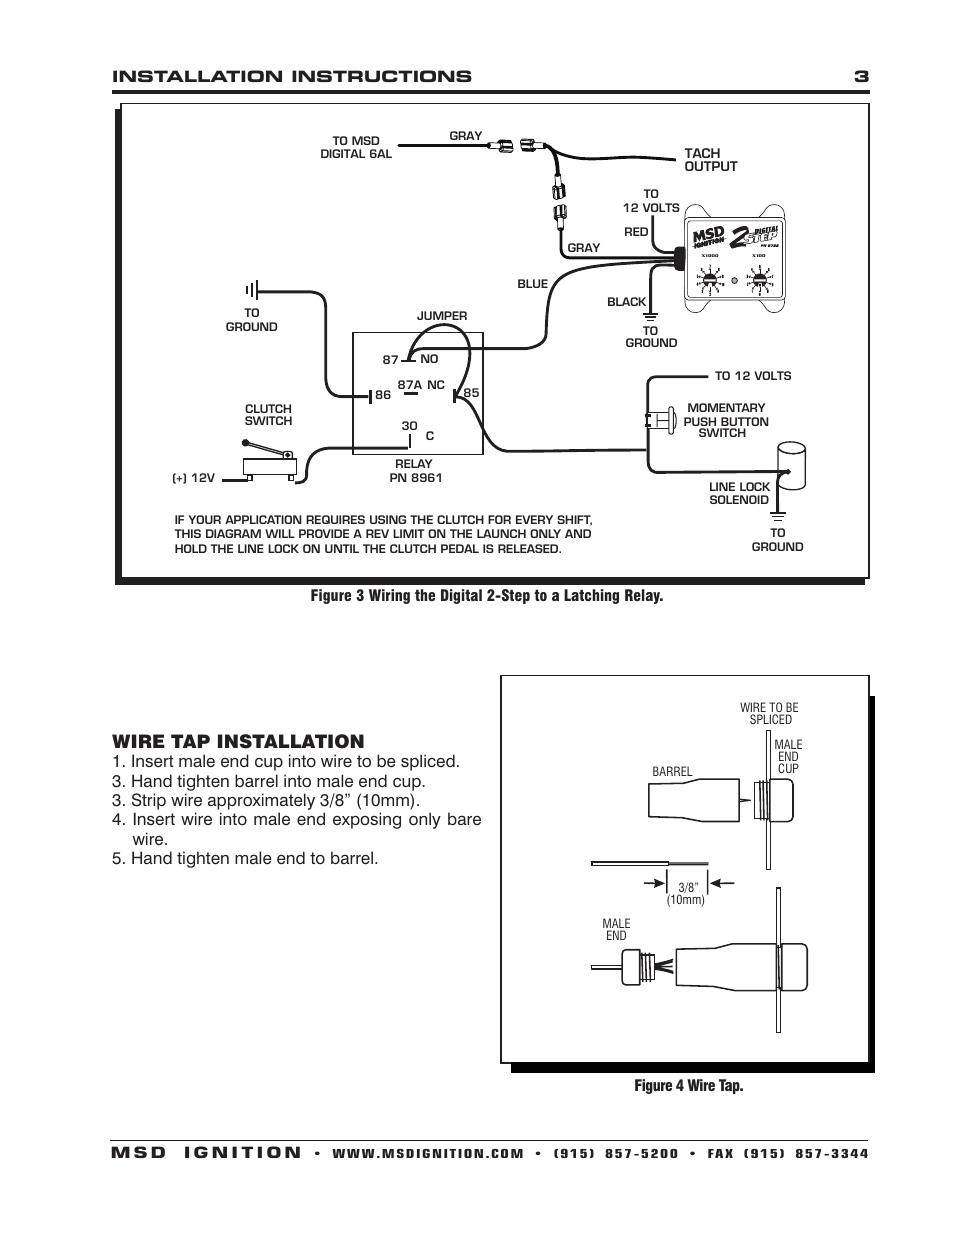 msd 8732 2 step rev control for digital 6al installation page3?resize\\\\\\\\\\\\\\\\\\\\\\\=665%2C861 jvc kd g340 wiring diagram the best wiring diagram 2017 jvc kd g340 wiring diagram at soozxer.org